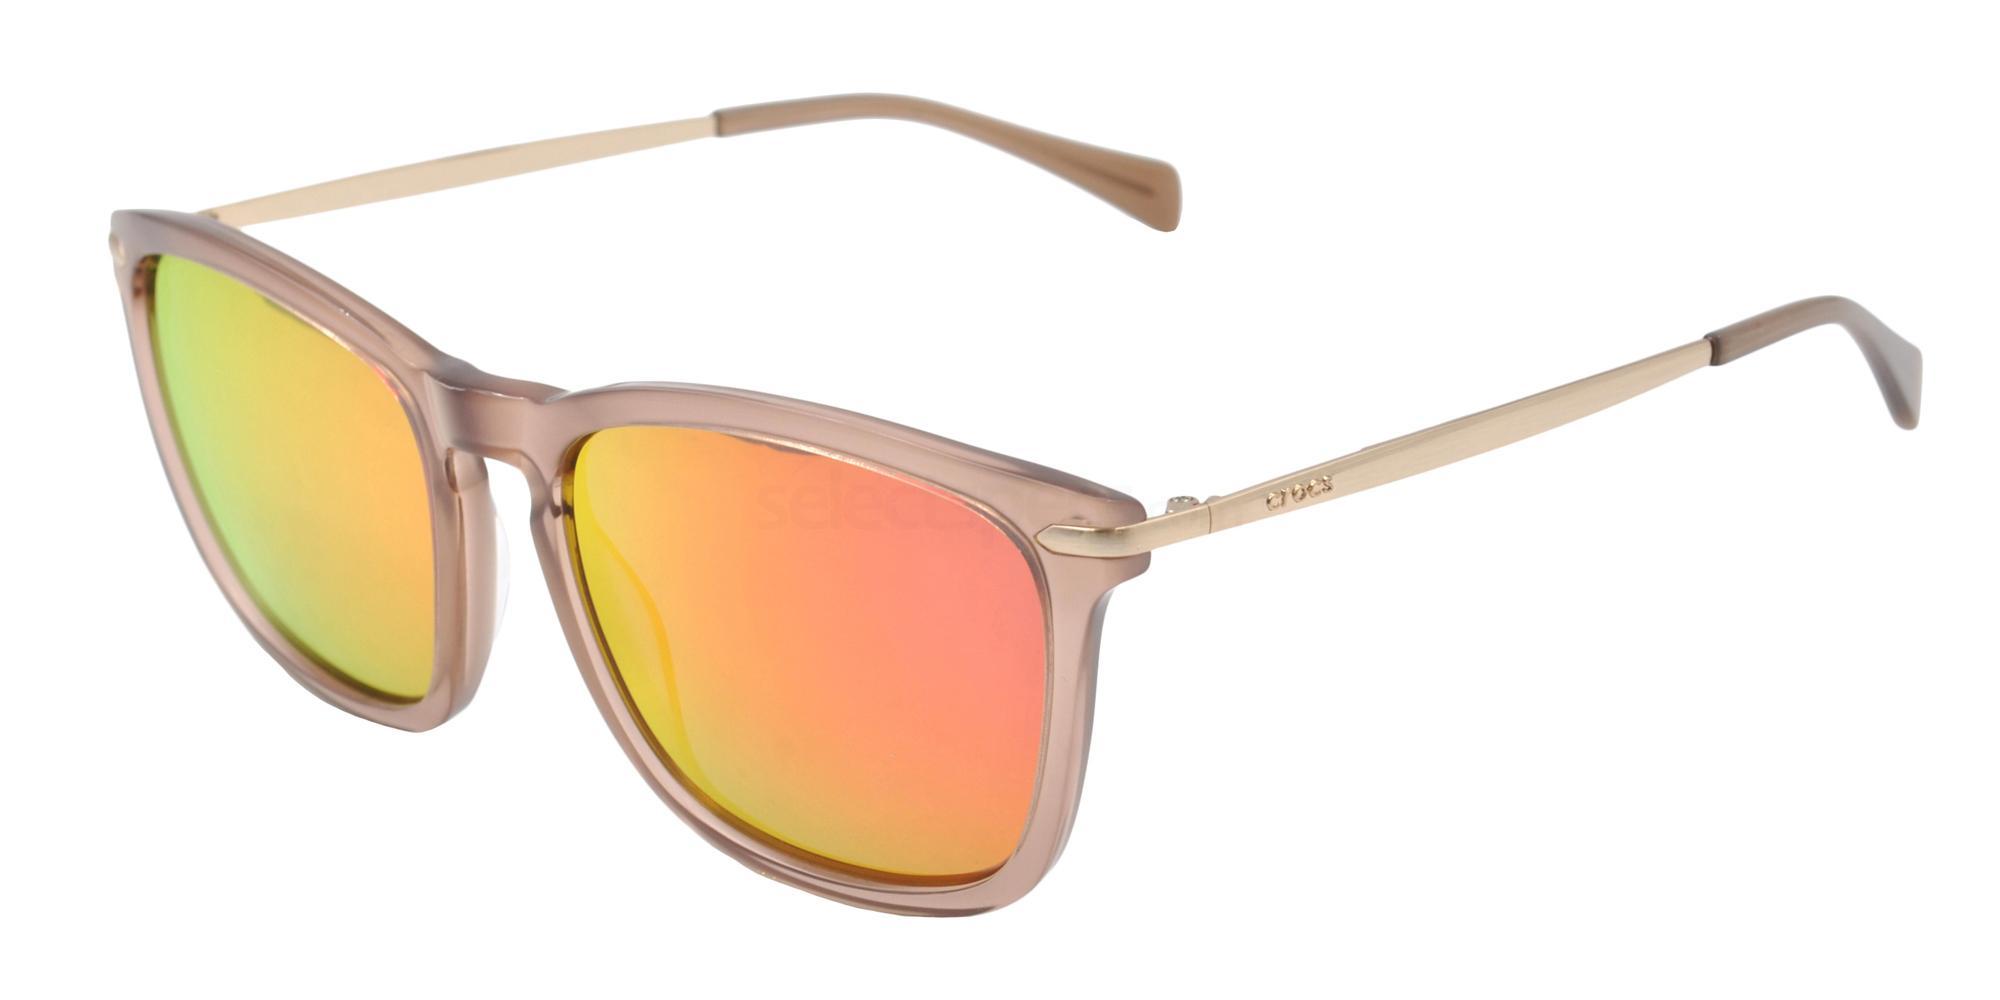 15GD CS047 Sunglasses, Crocs Eyewear